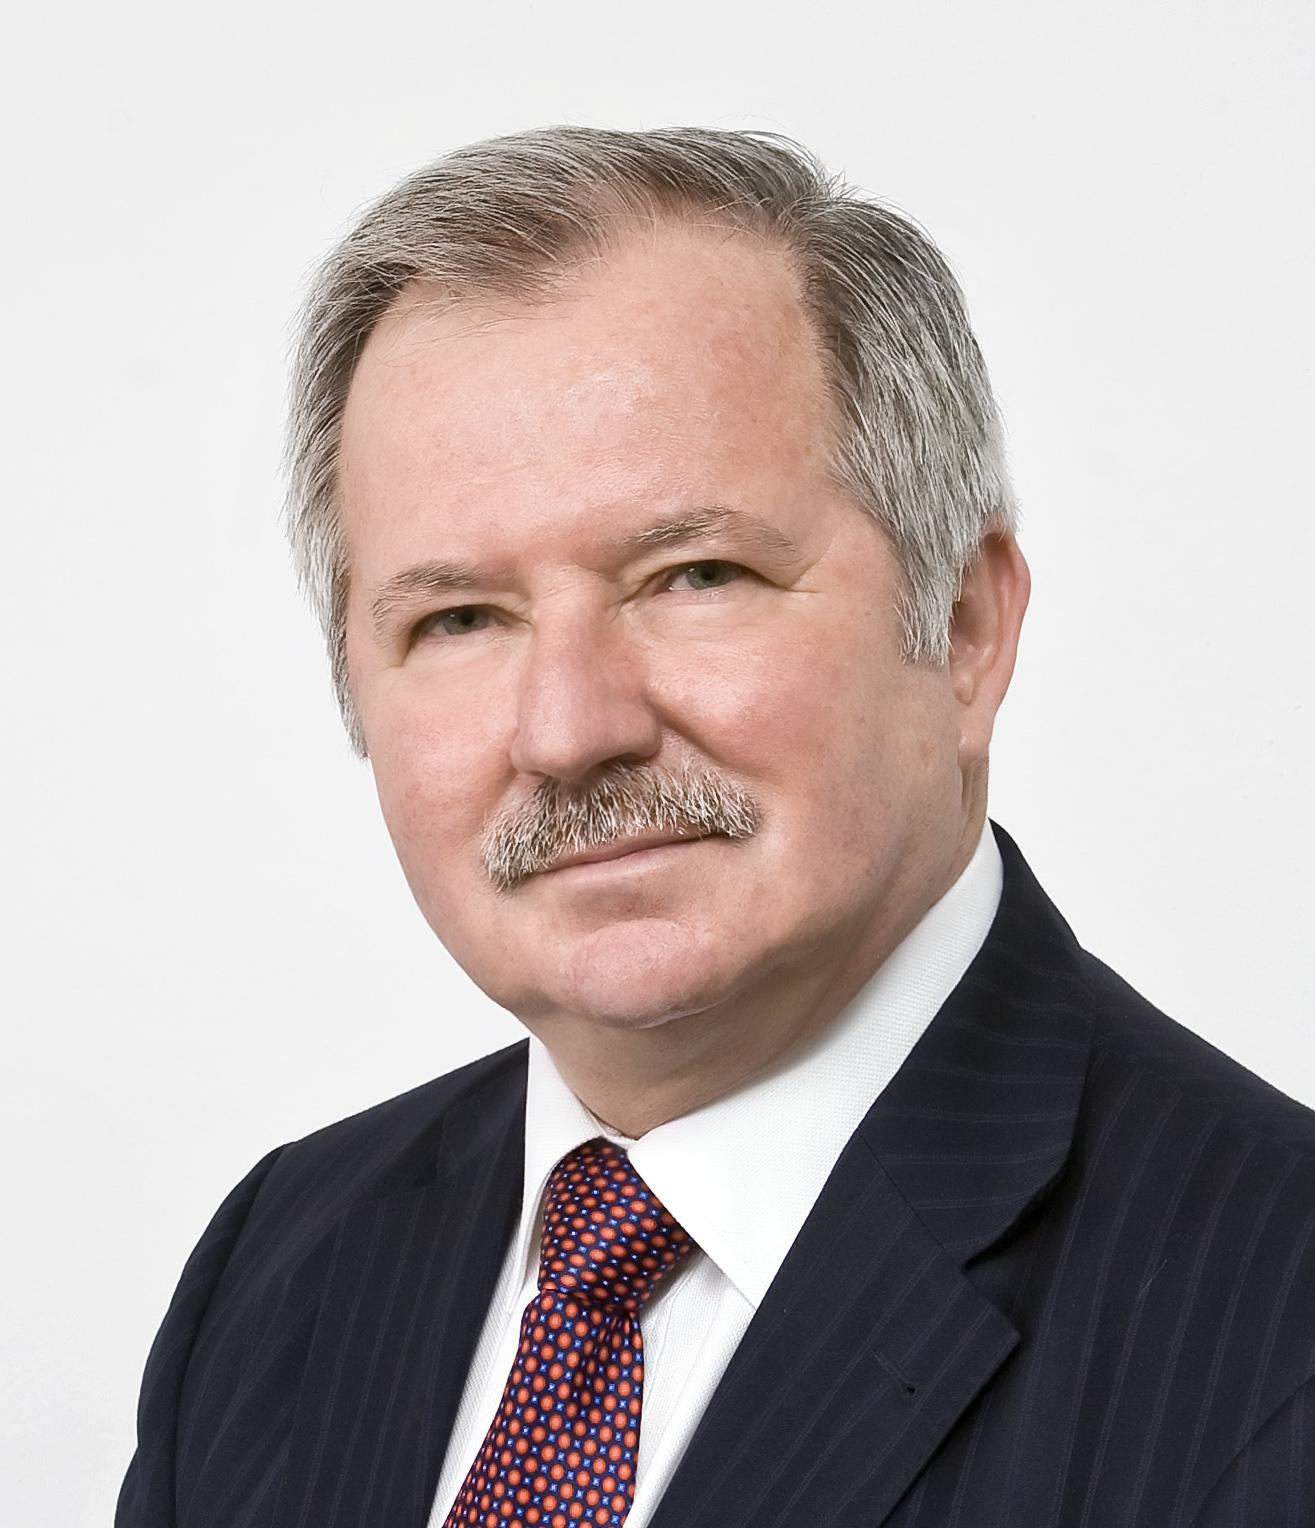 Tzolo Voutov